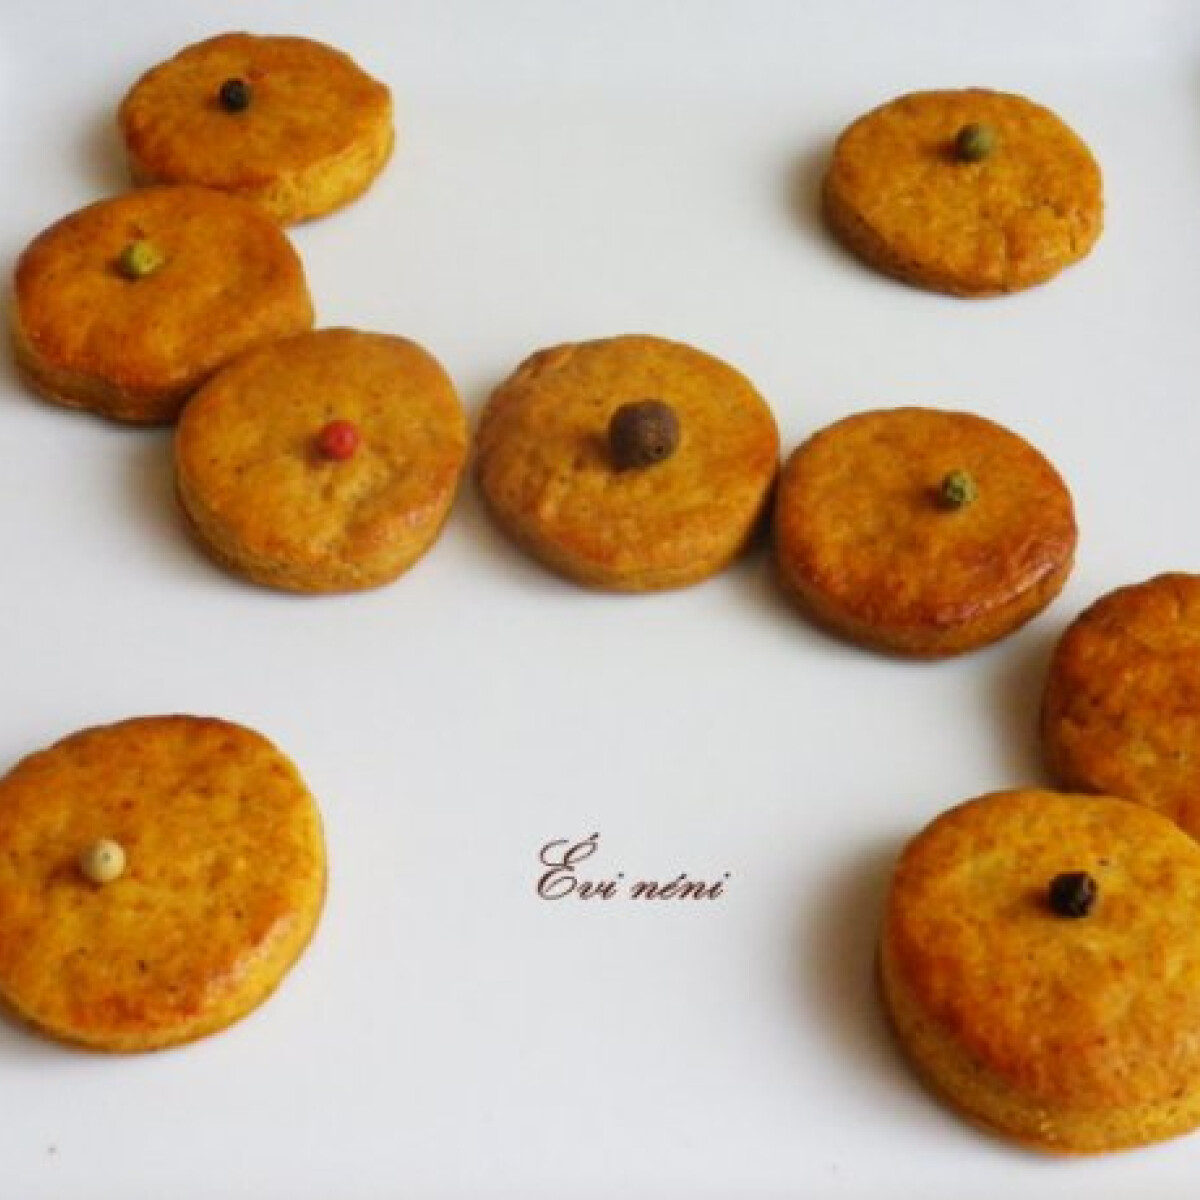 Borsos keksz